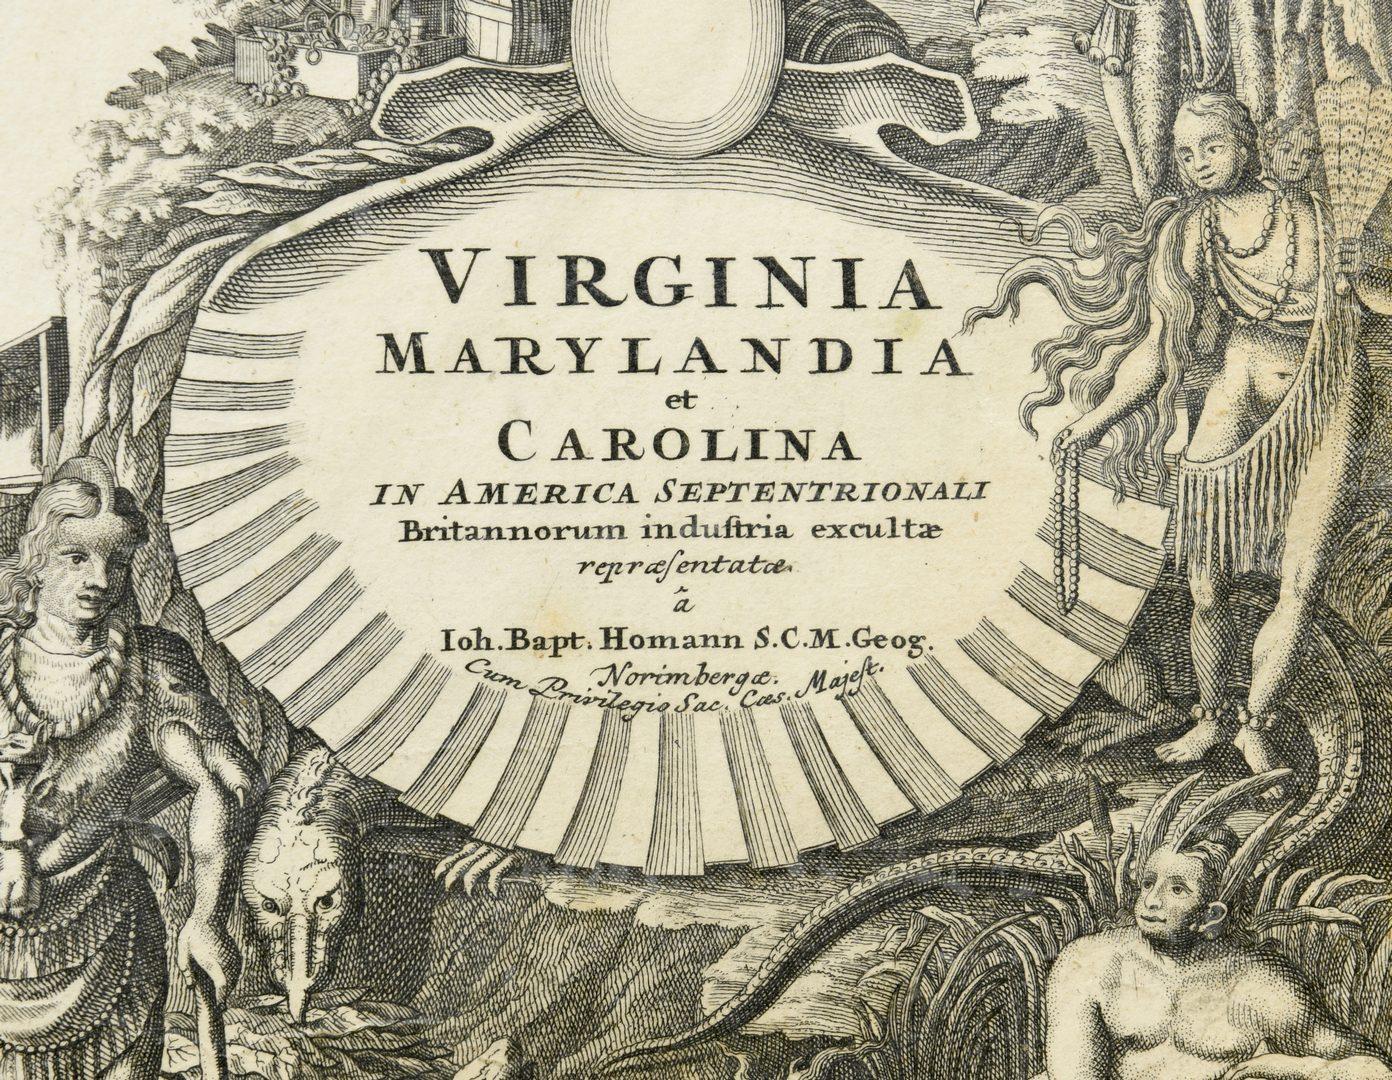 Lot 267: Johann Baptist Homann map of Virginia, Maryland, and Carolina, 1714